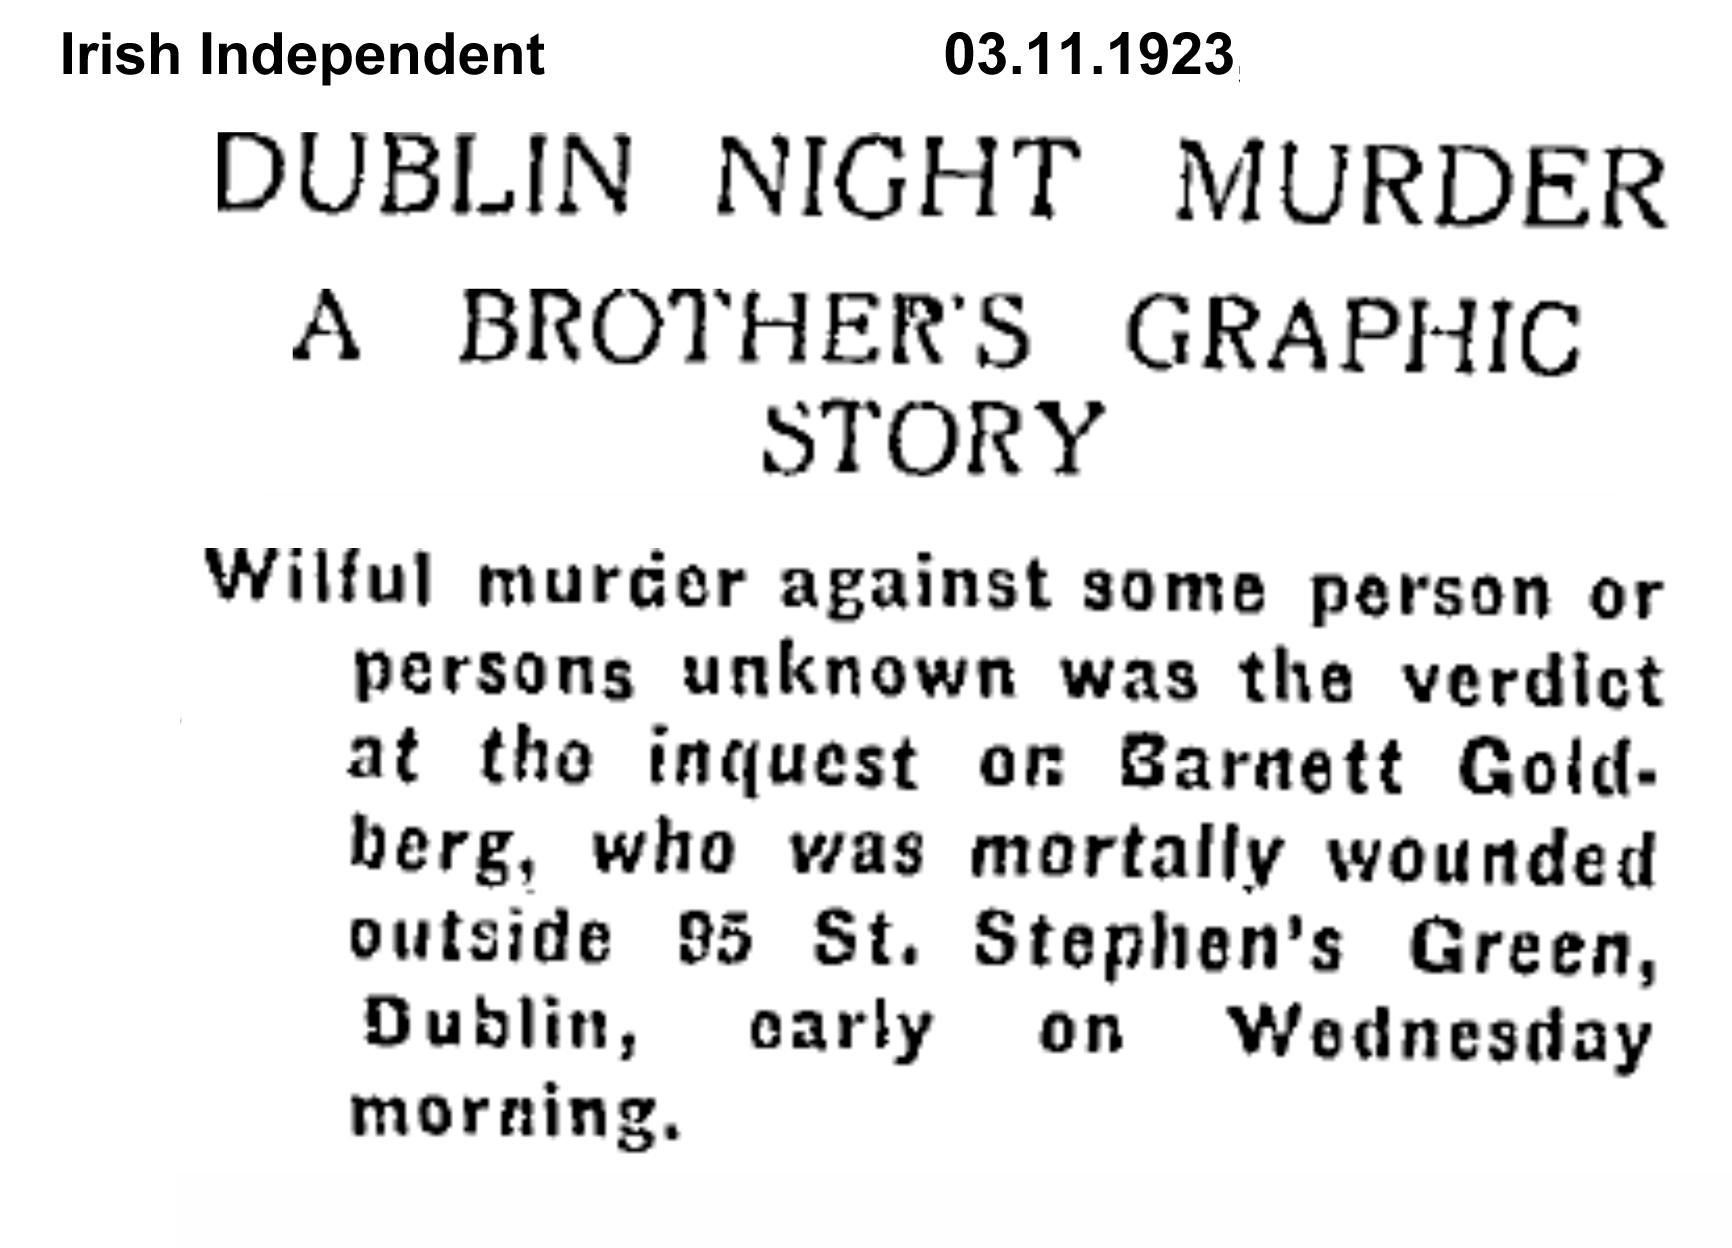 Goldberg inquest Burning of Dublin Custom House 1921